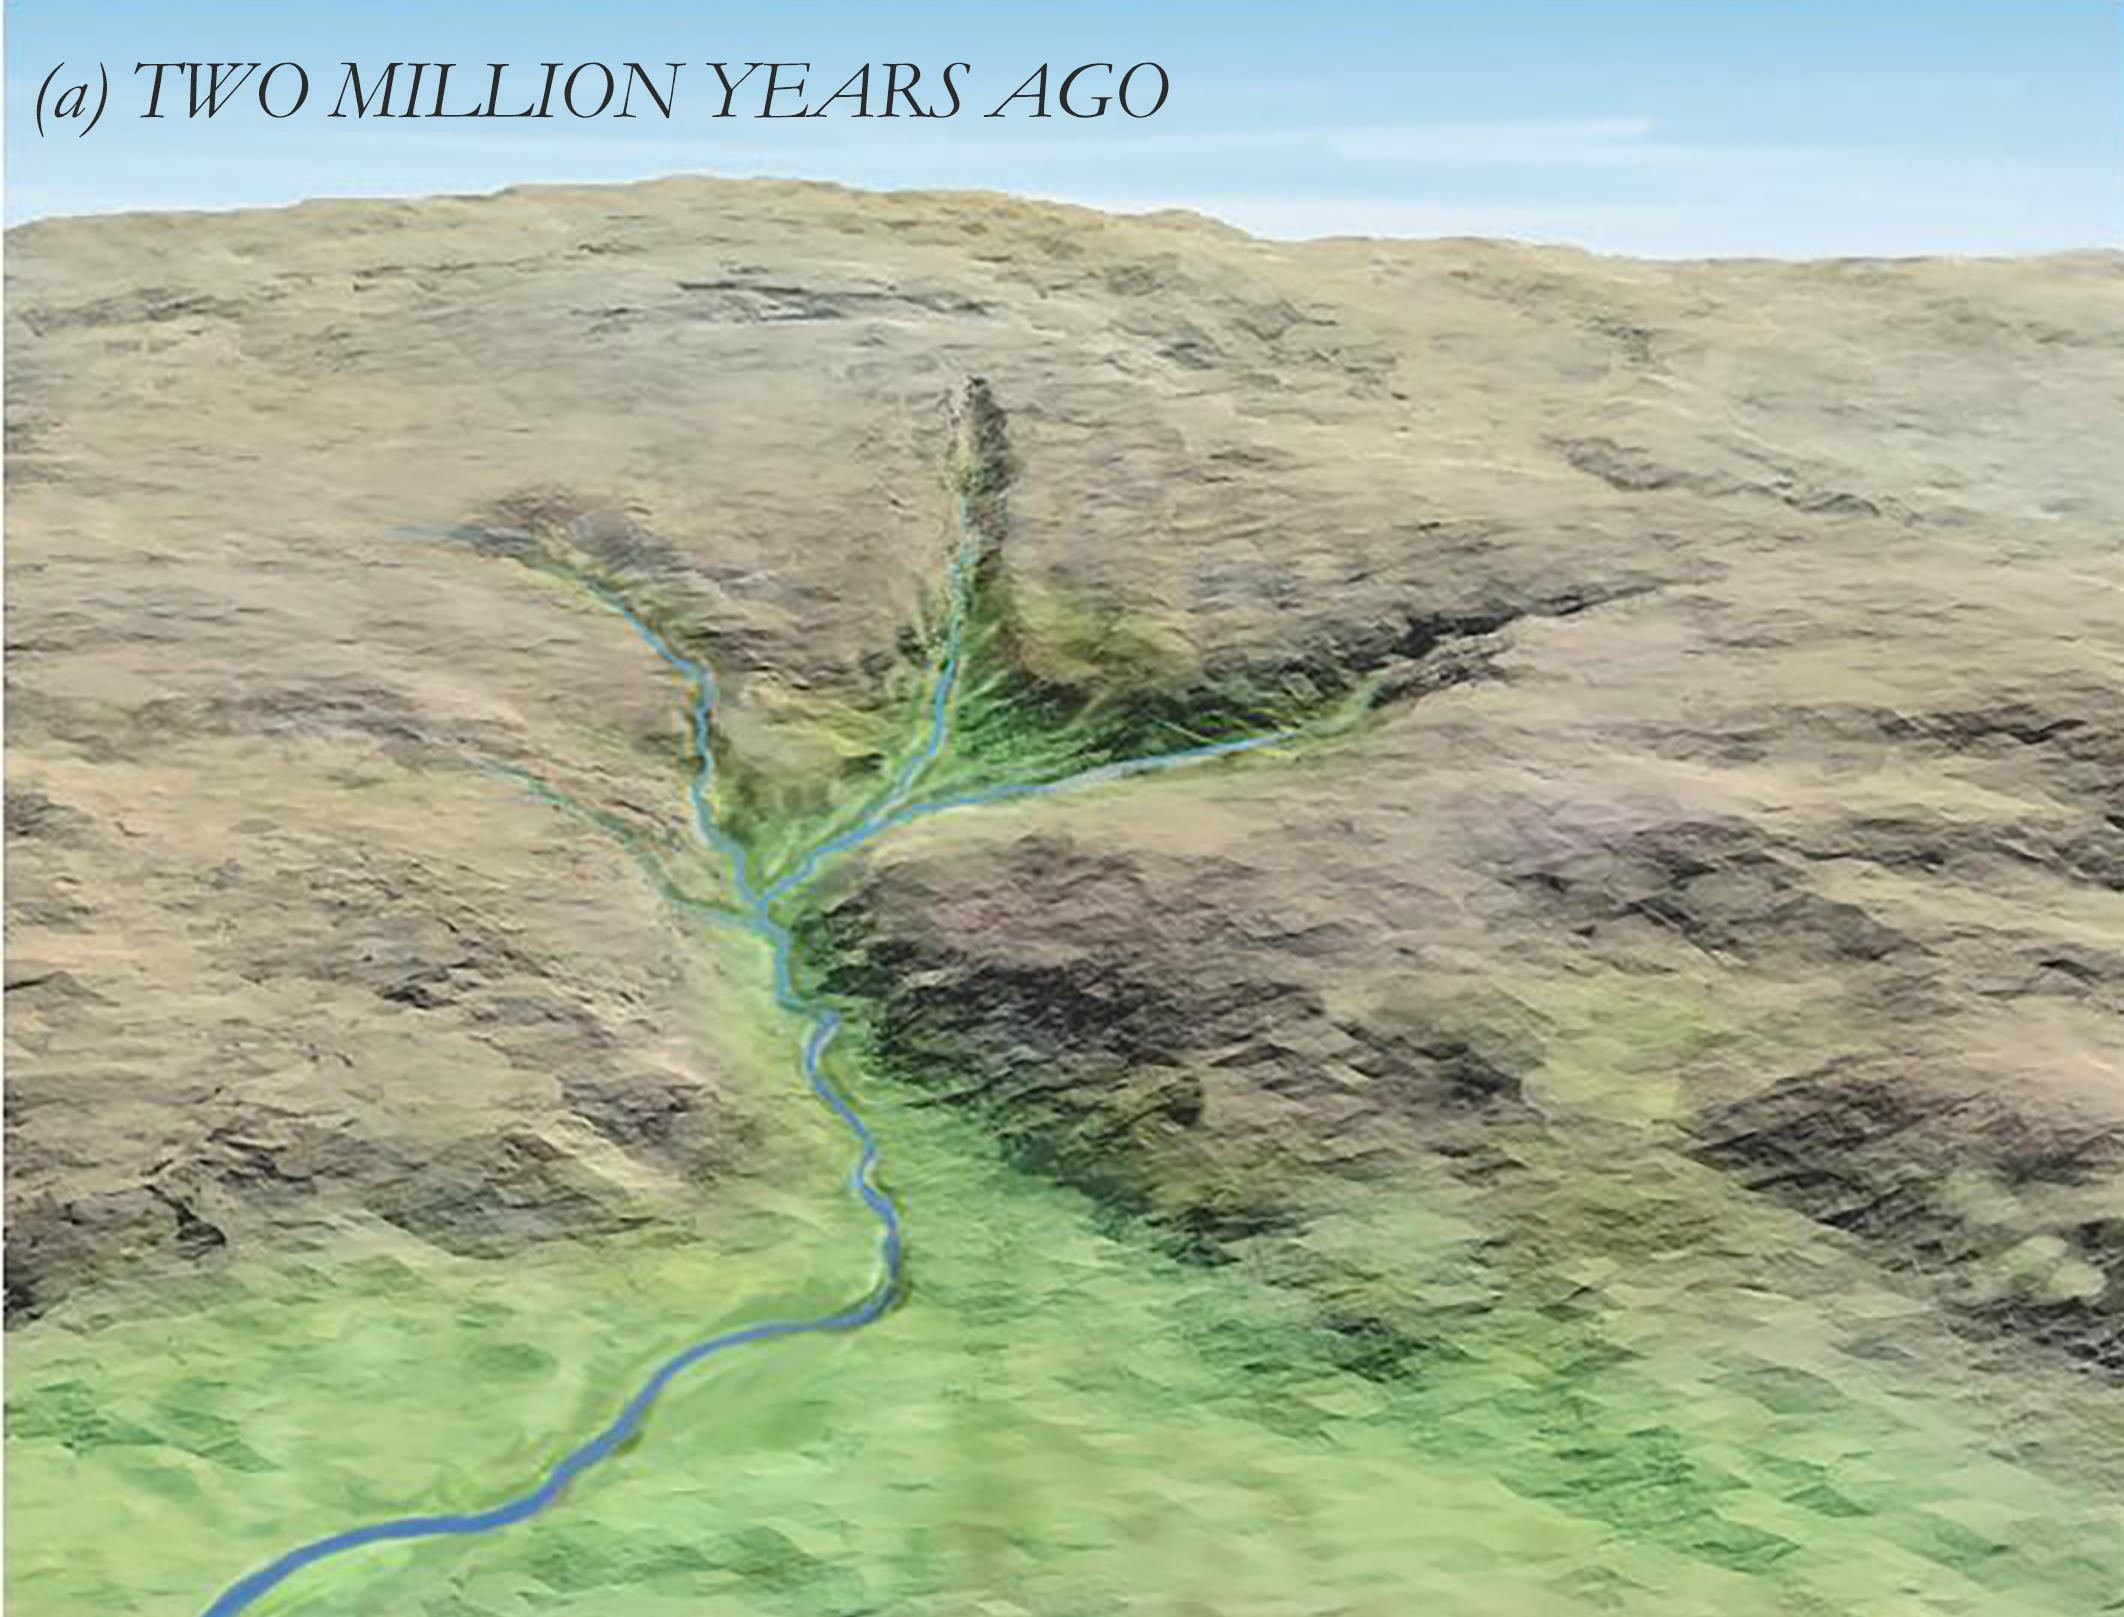 Creation of the landscape in the Isdal-region. (a) 2 million years ago. (Inge Aarseth/Kjell Helge Sjøstrøm/Masaoki Adachi)